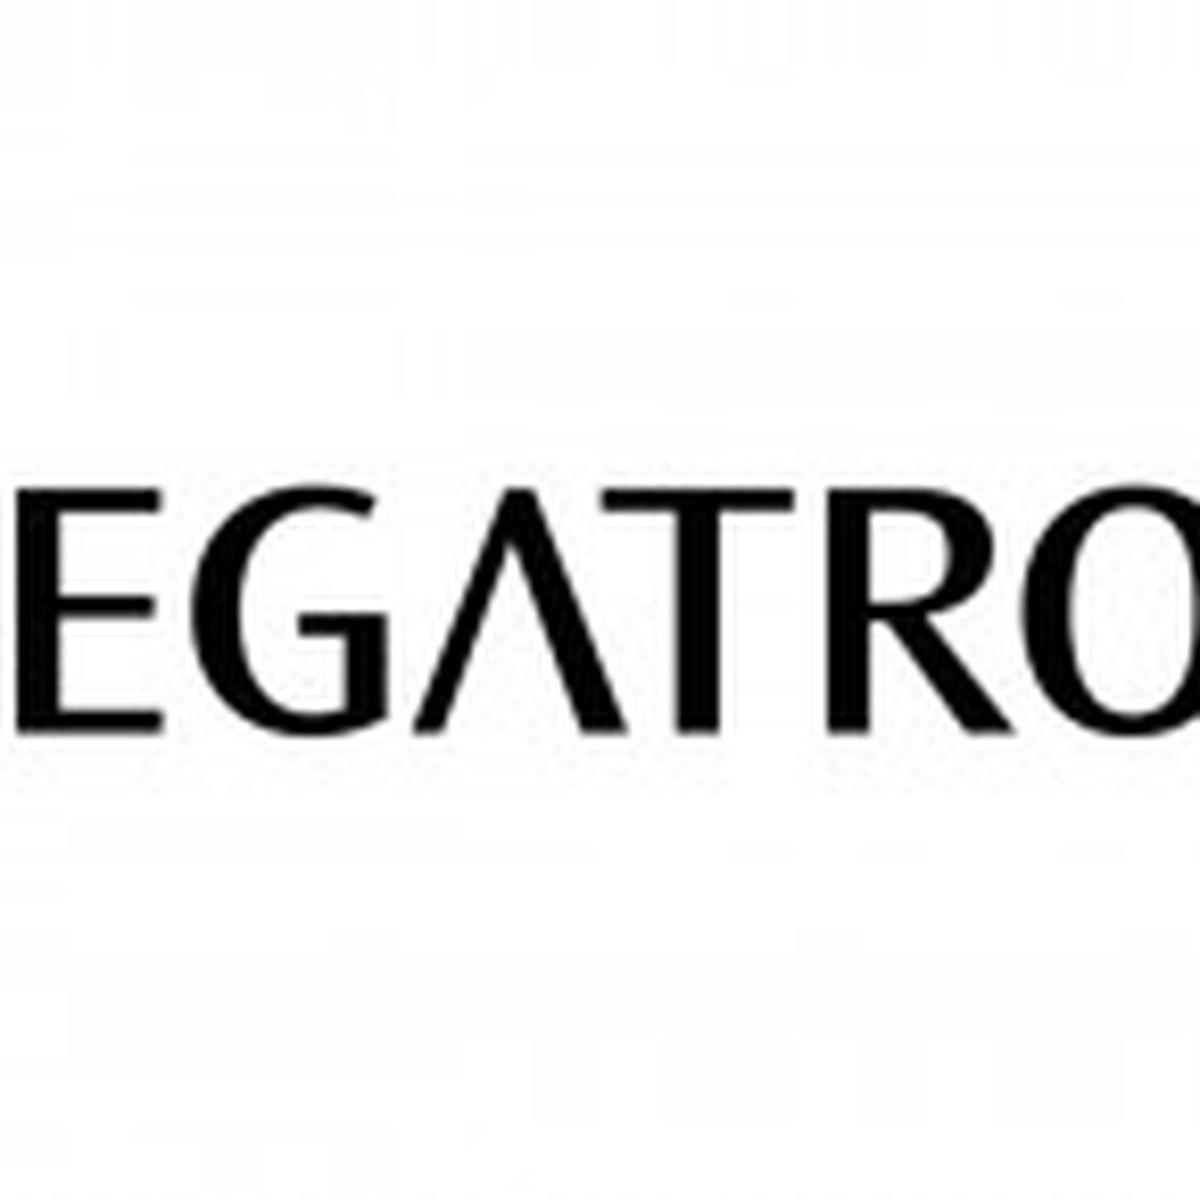 Apple to Shift iMac Production from Quanta to Pegatron? - MacRumors